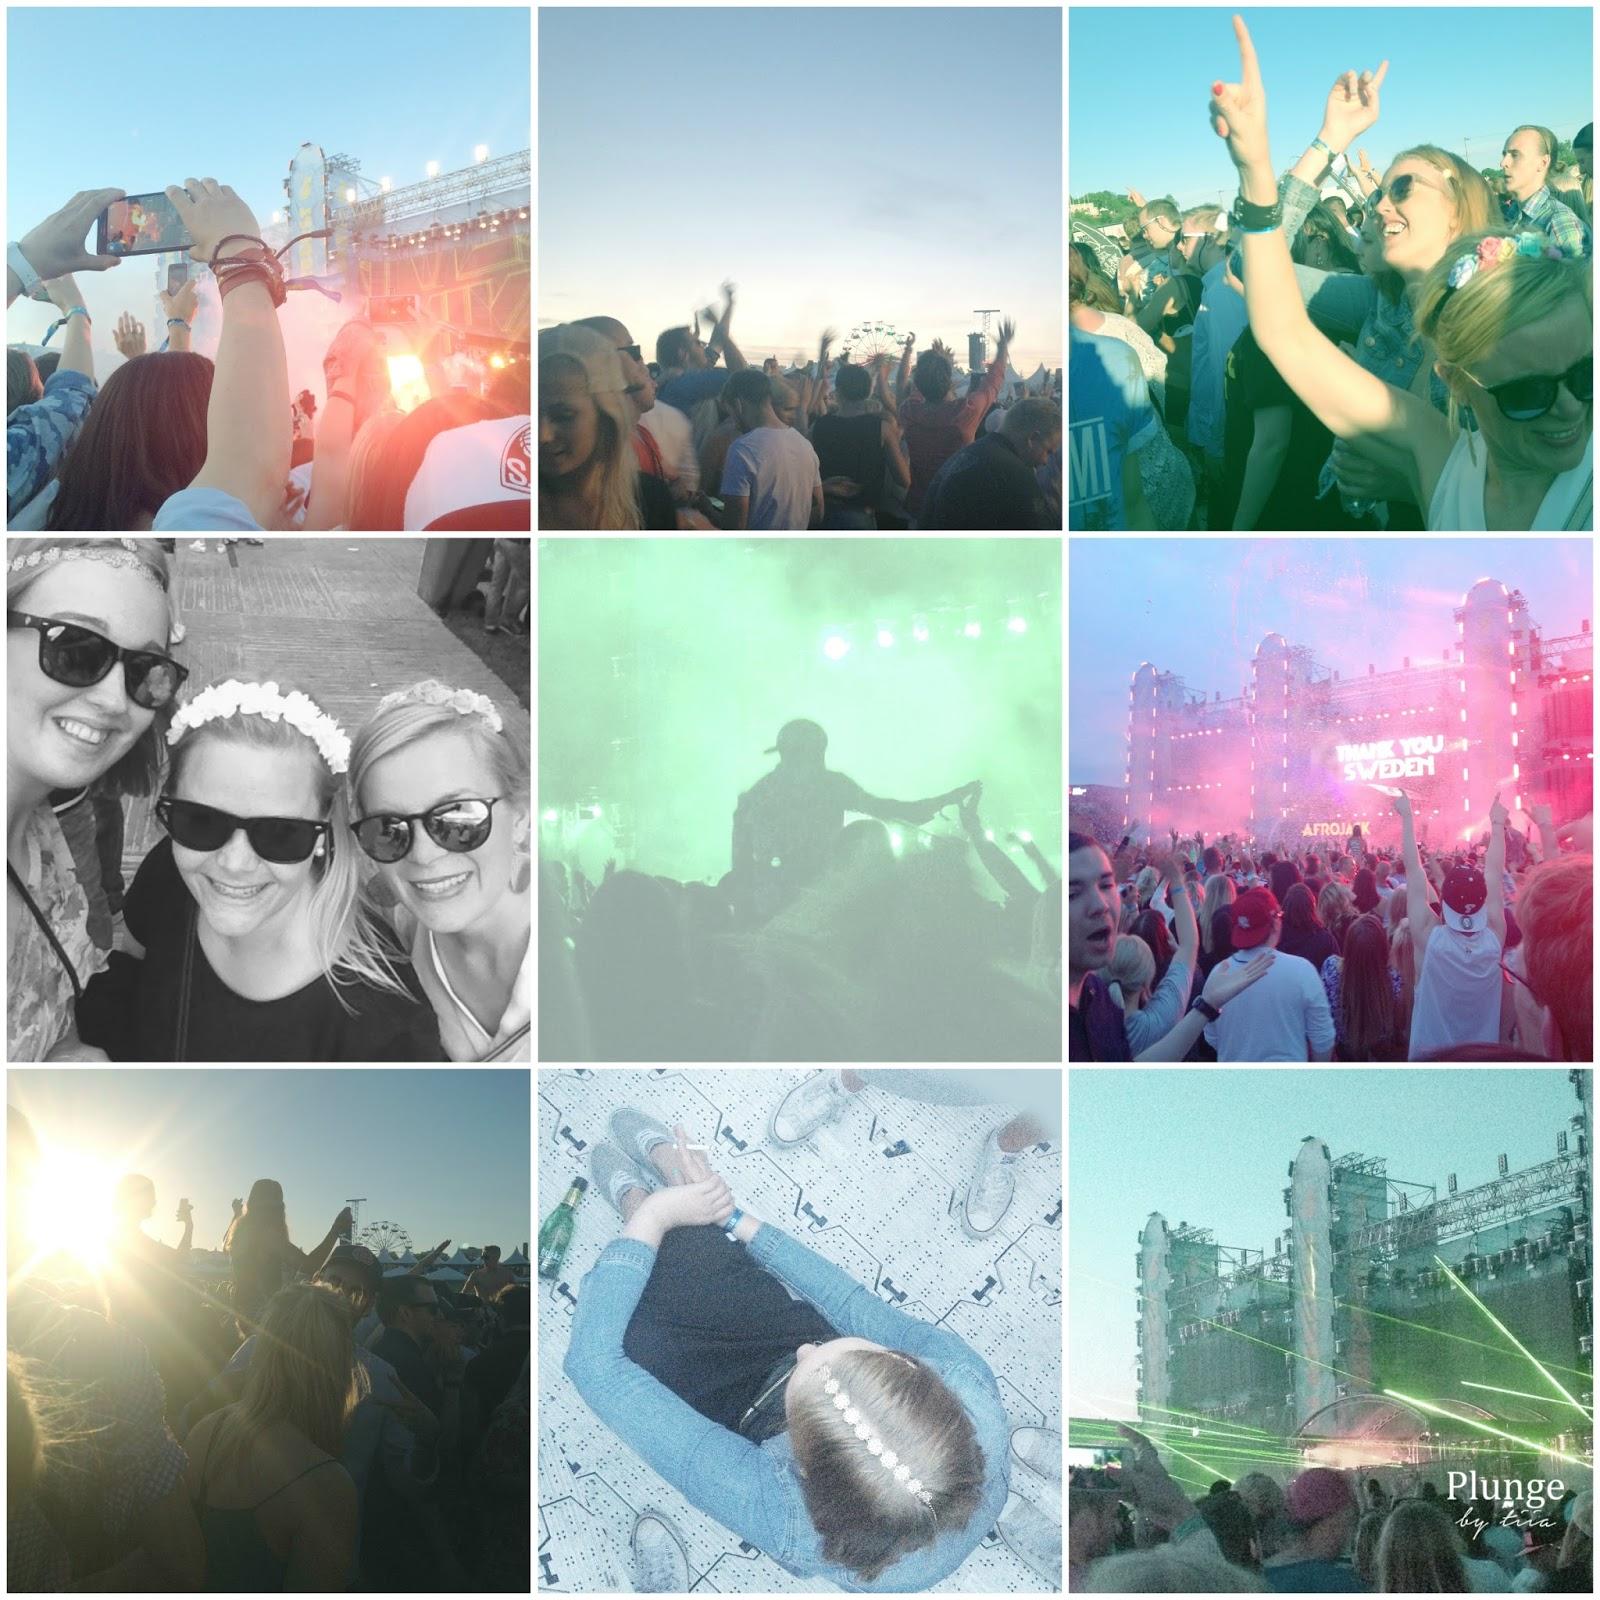 Summerburst 2015